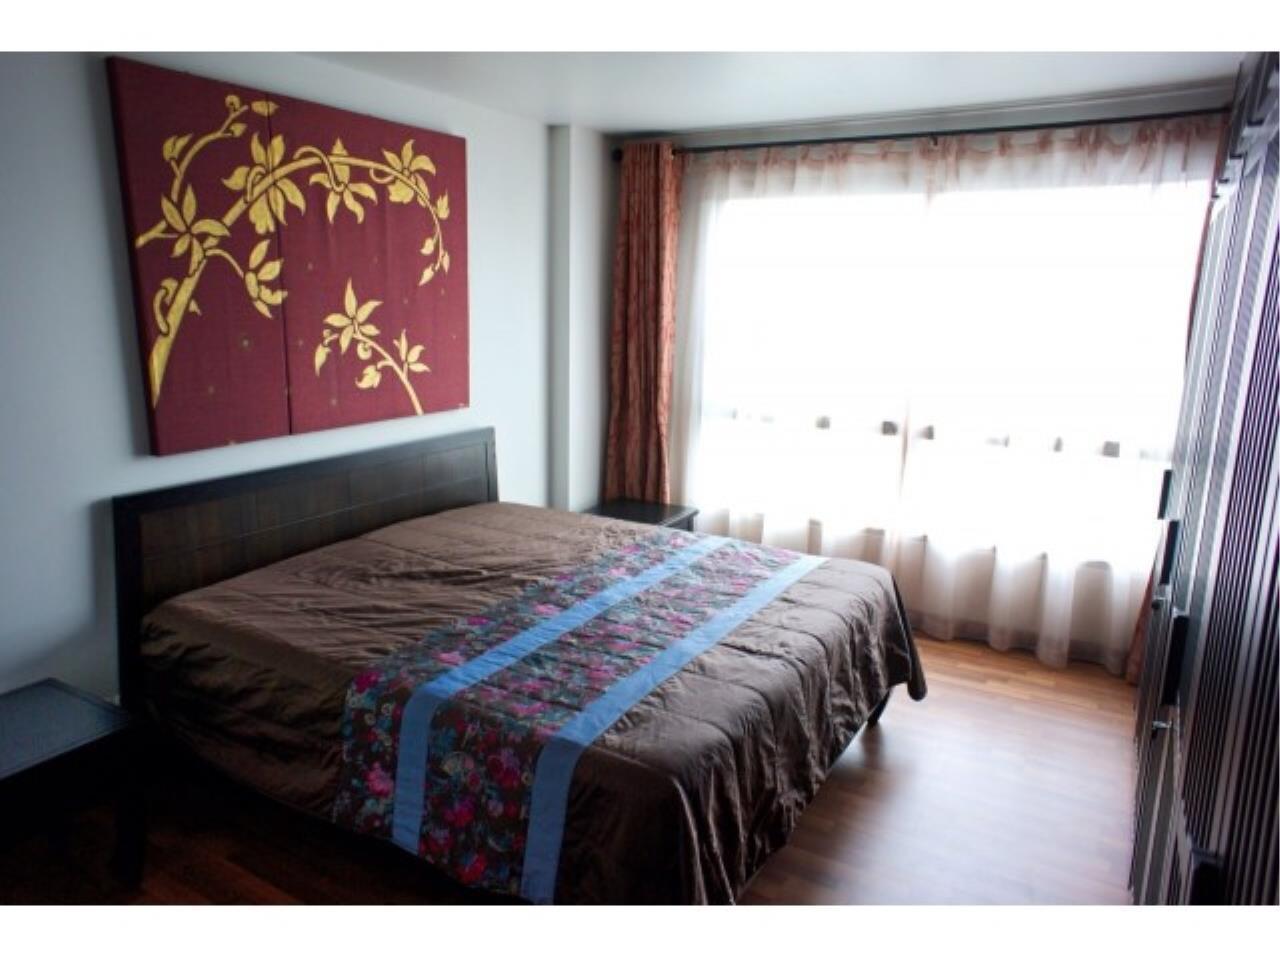 You Estate Agency's Sale Centric scene paholyathin 9, 59 sq.m Ari BTS 1